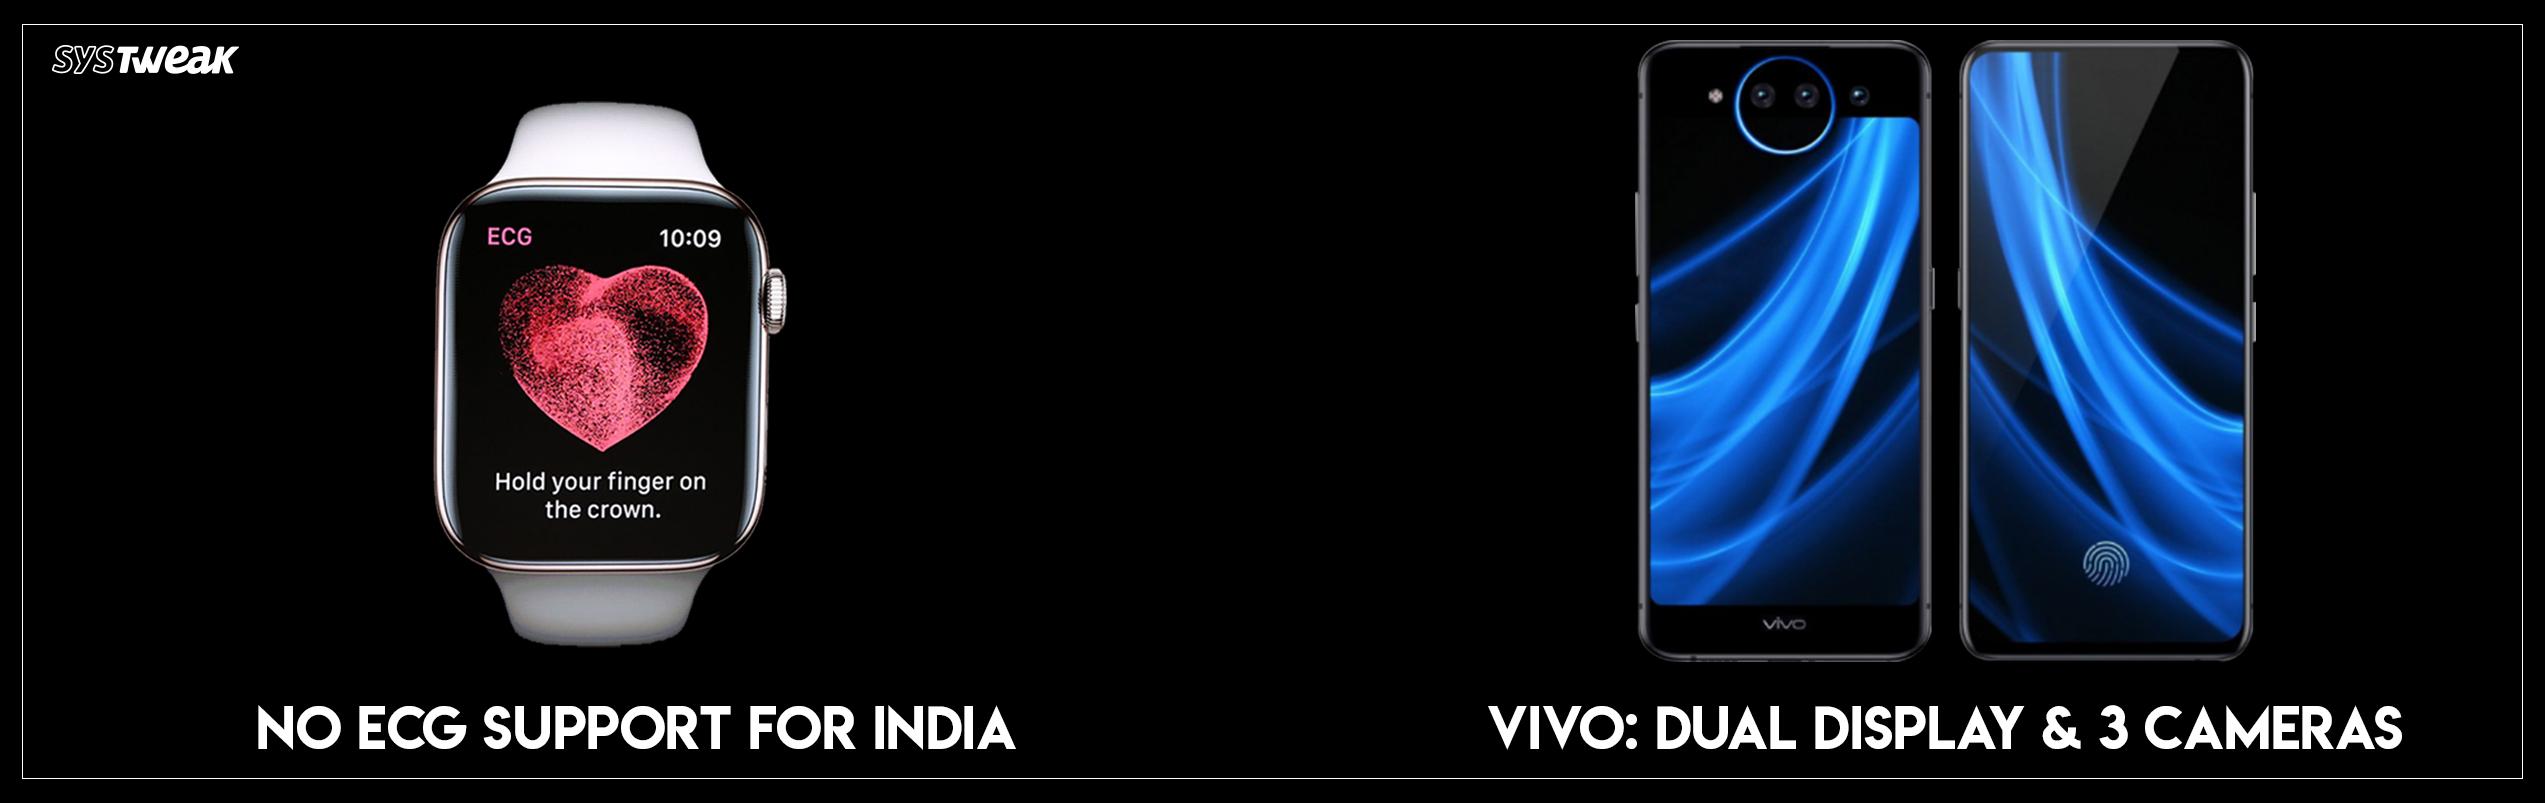 Newsletter: WatchOS 5.1.2 Update: No Ecg For India & Vivo's Dual Display, 3 Camera Smartphone